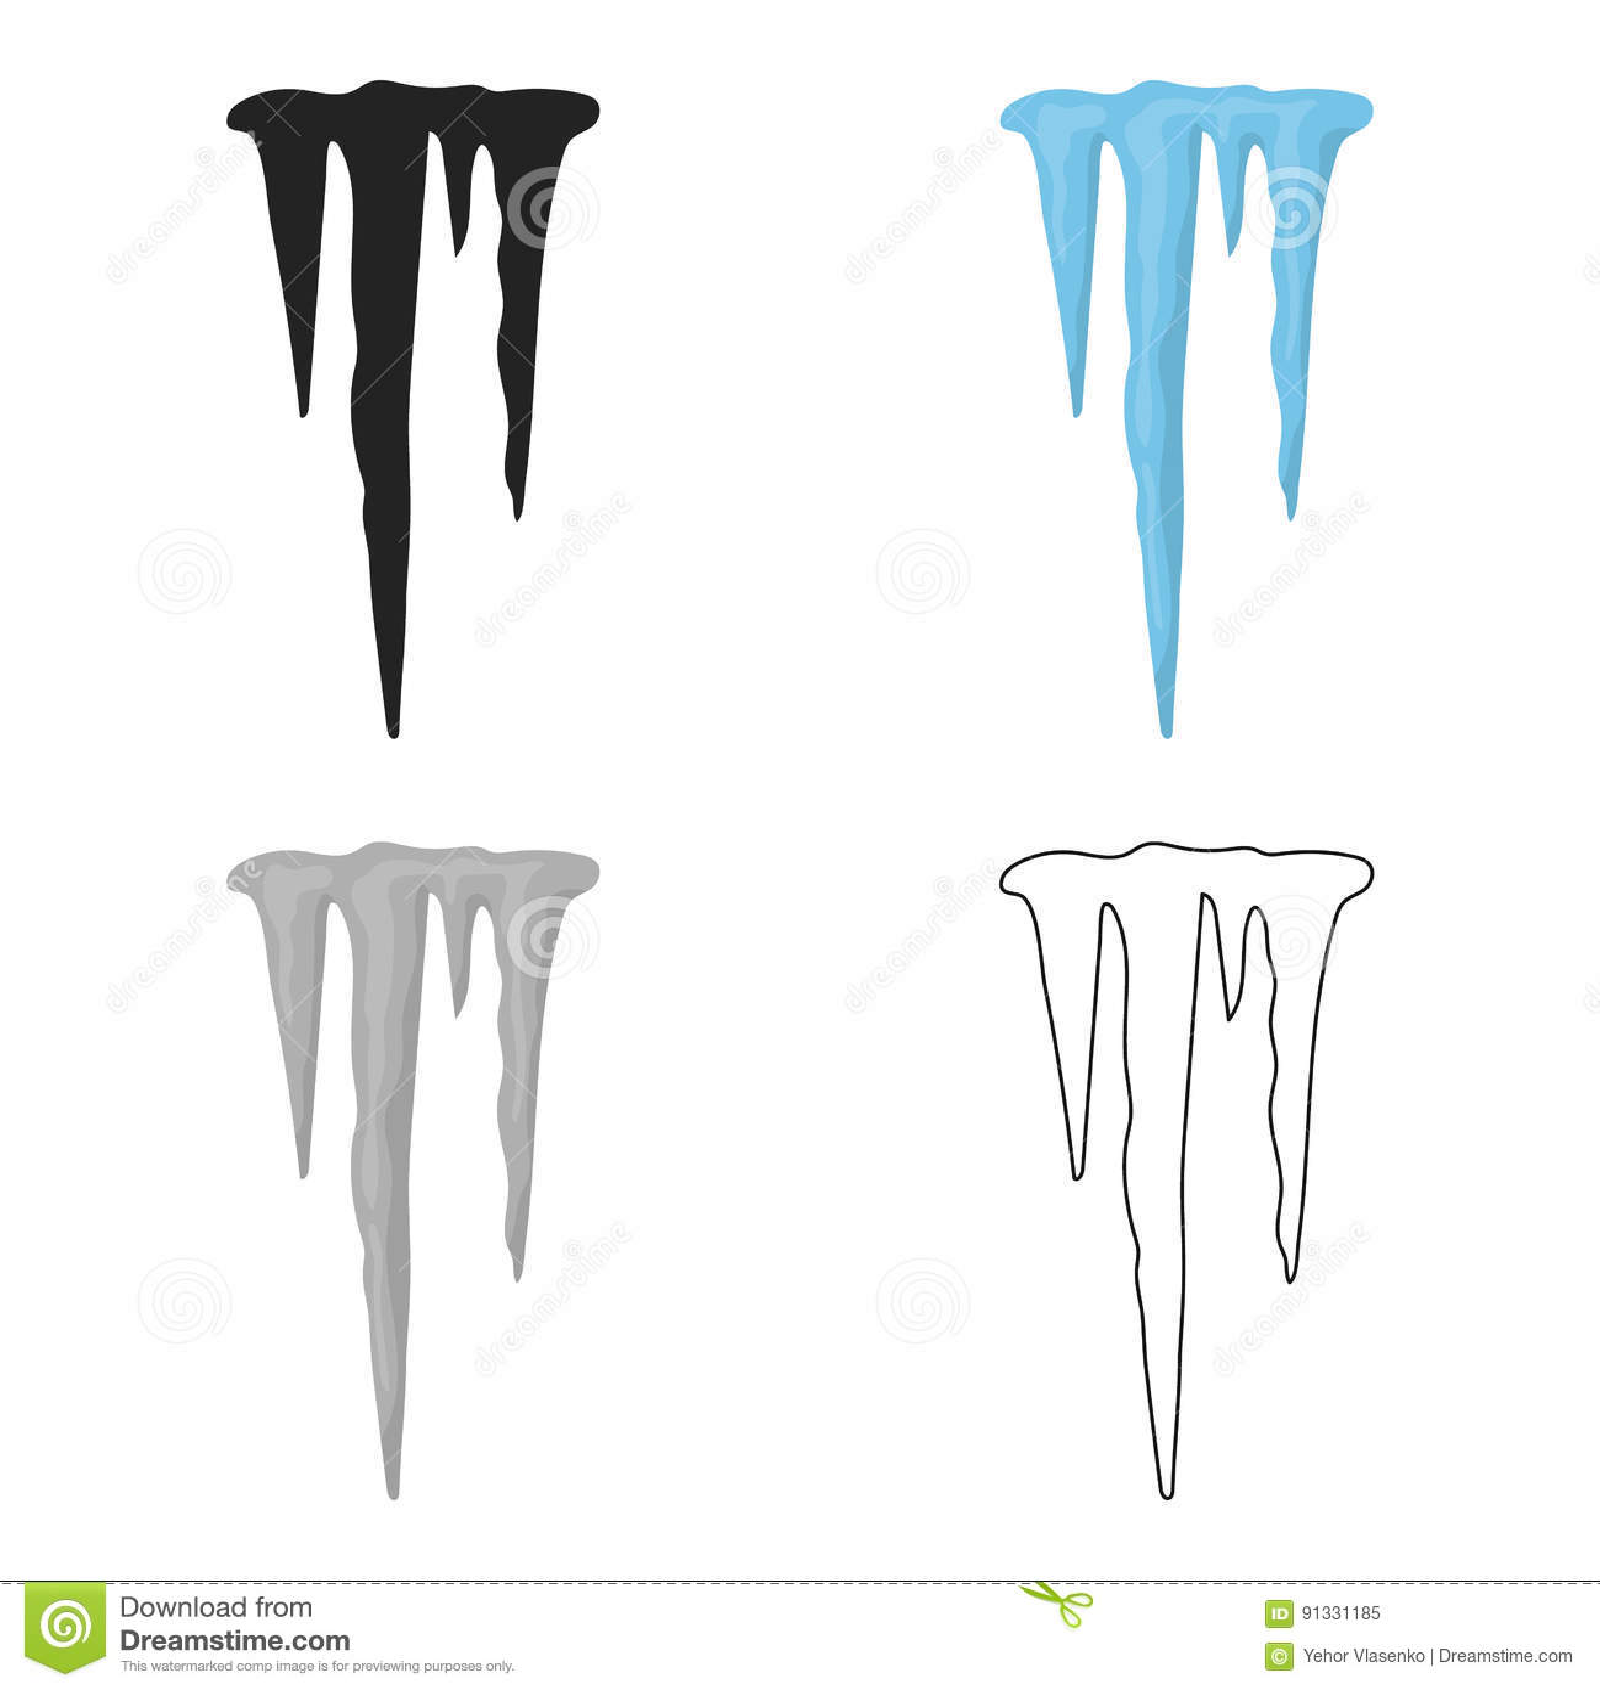 Icicles icon in cartoon style isolated on white background icicles icon in cartoon style isolated on white background weather symbol stock vector illustration buycottarizona Images